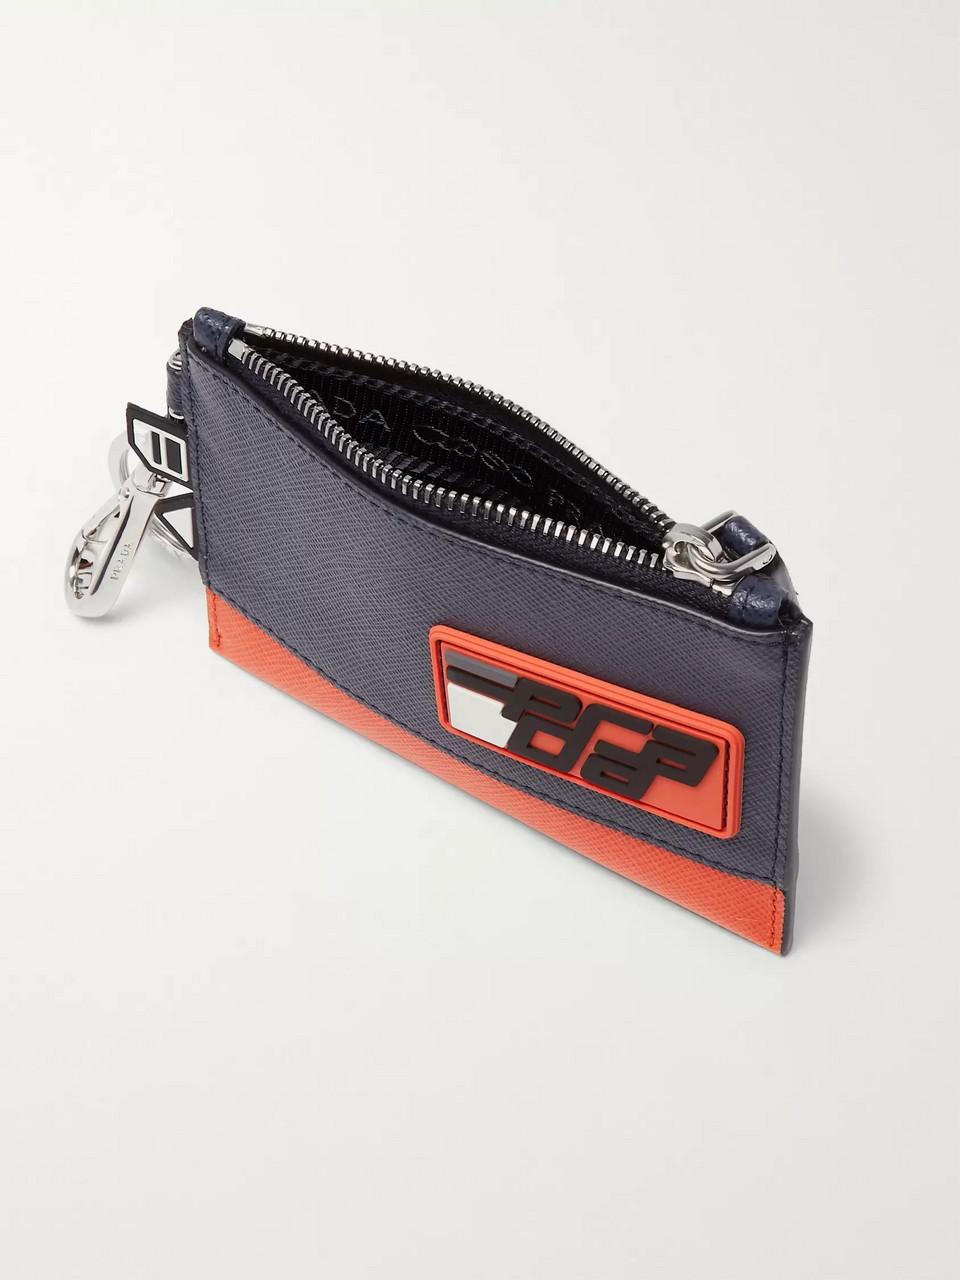 7cbad2b90a3 Navy Logo-Appliquéd Two-Tone Saffiano Leather Pouch | Prada | MR PORTER